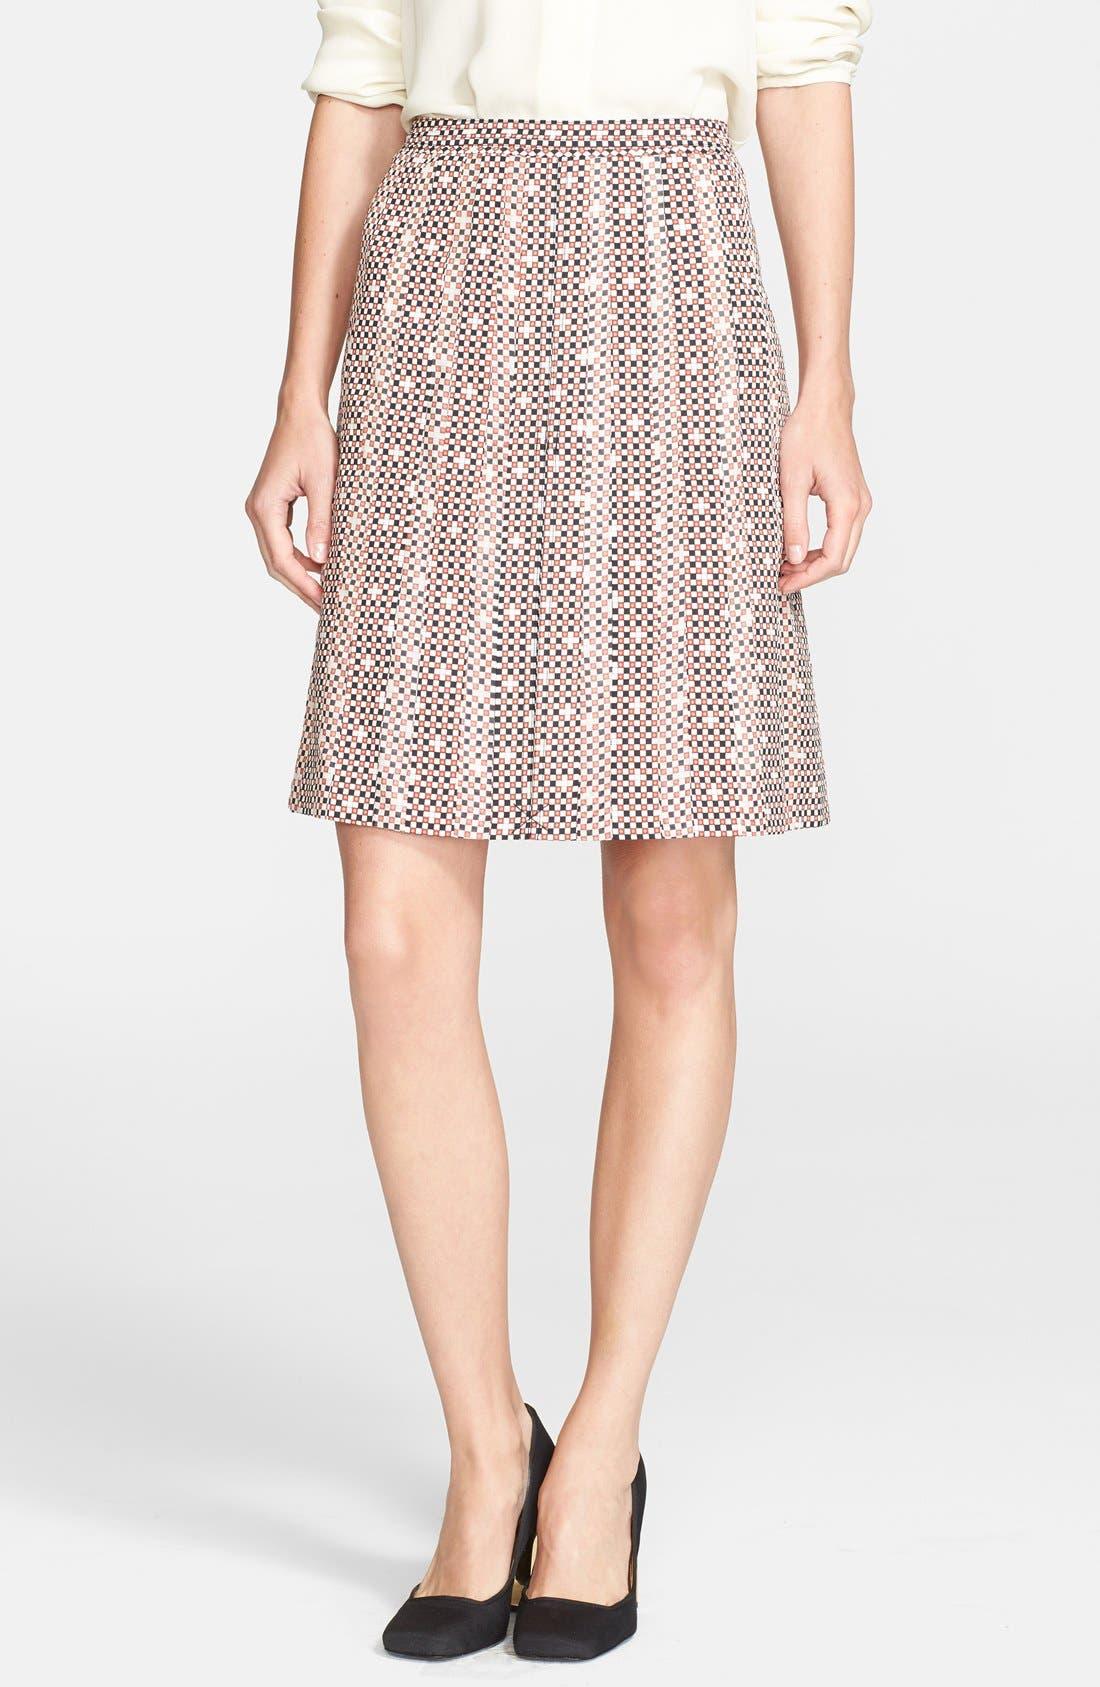 Alternate Image 1 Selected - Tory Burch 'Floria' Print Stretch Silk Skirt